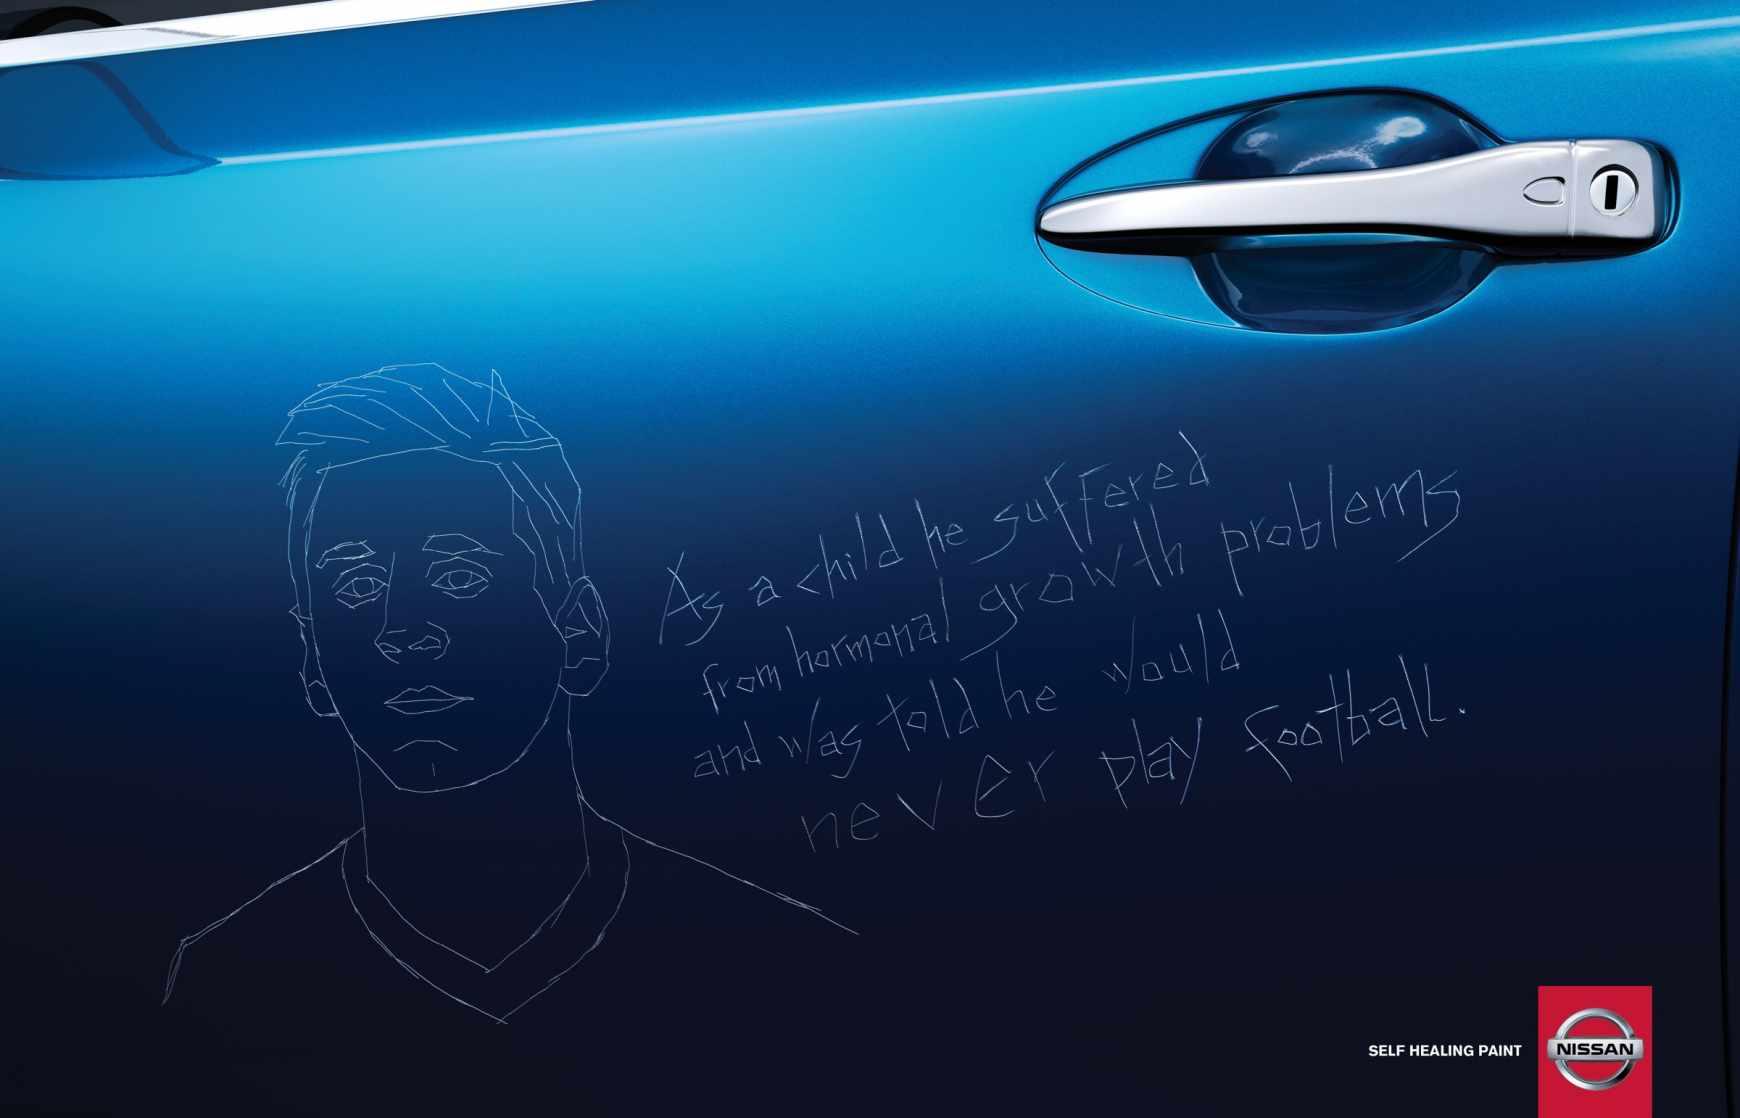 Iklan-Mobil-Nissan-Self-Healing-Paint-Self-healing-stories-Lionel